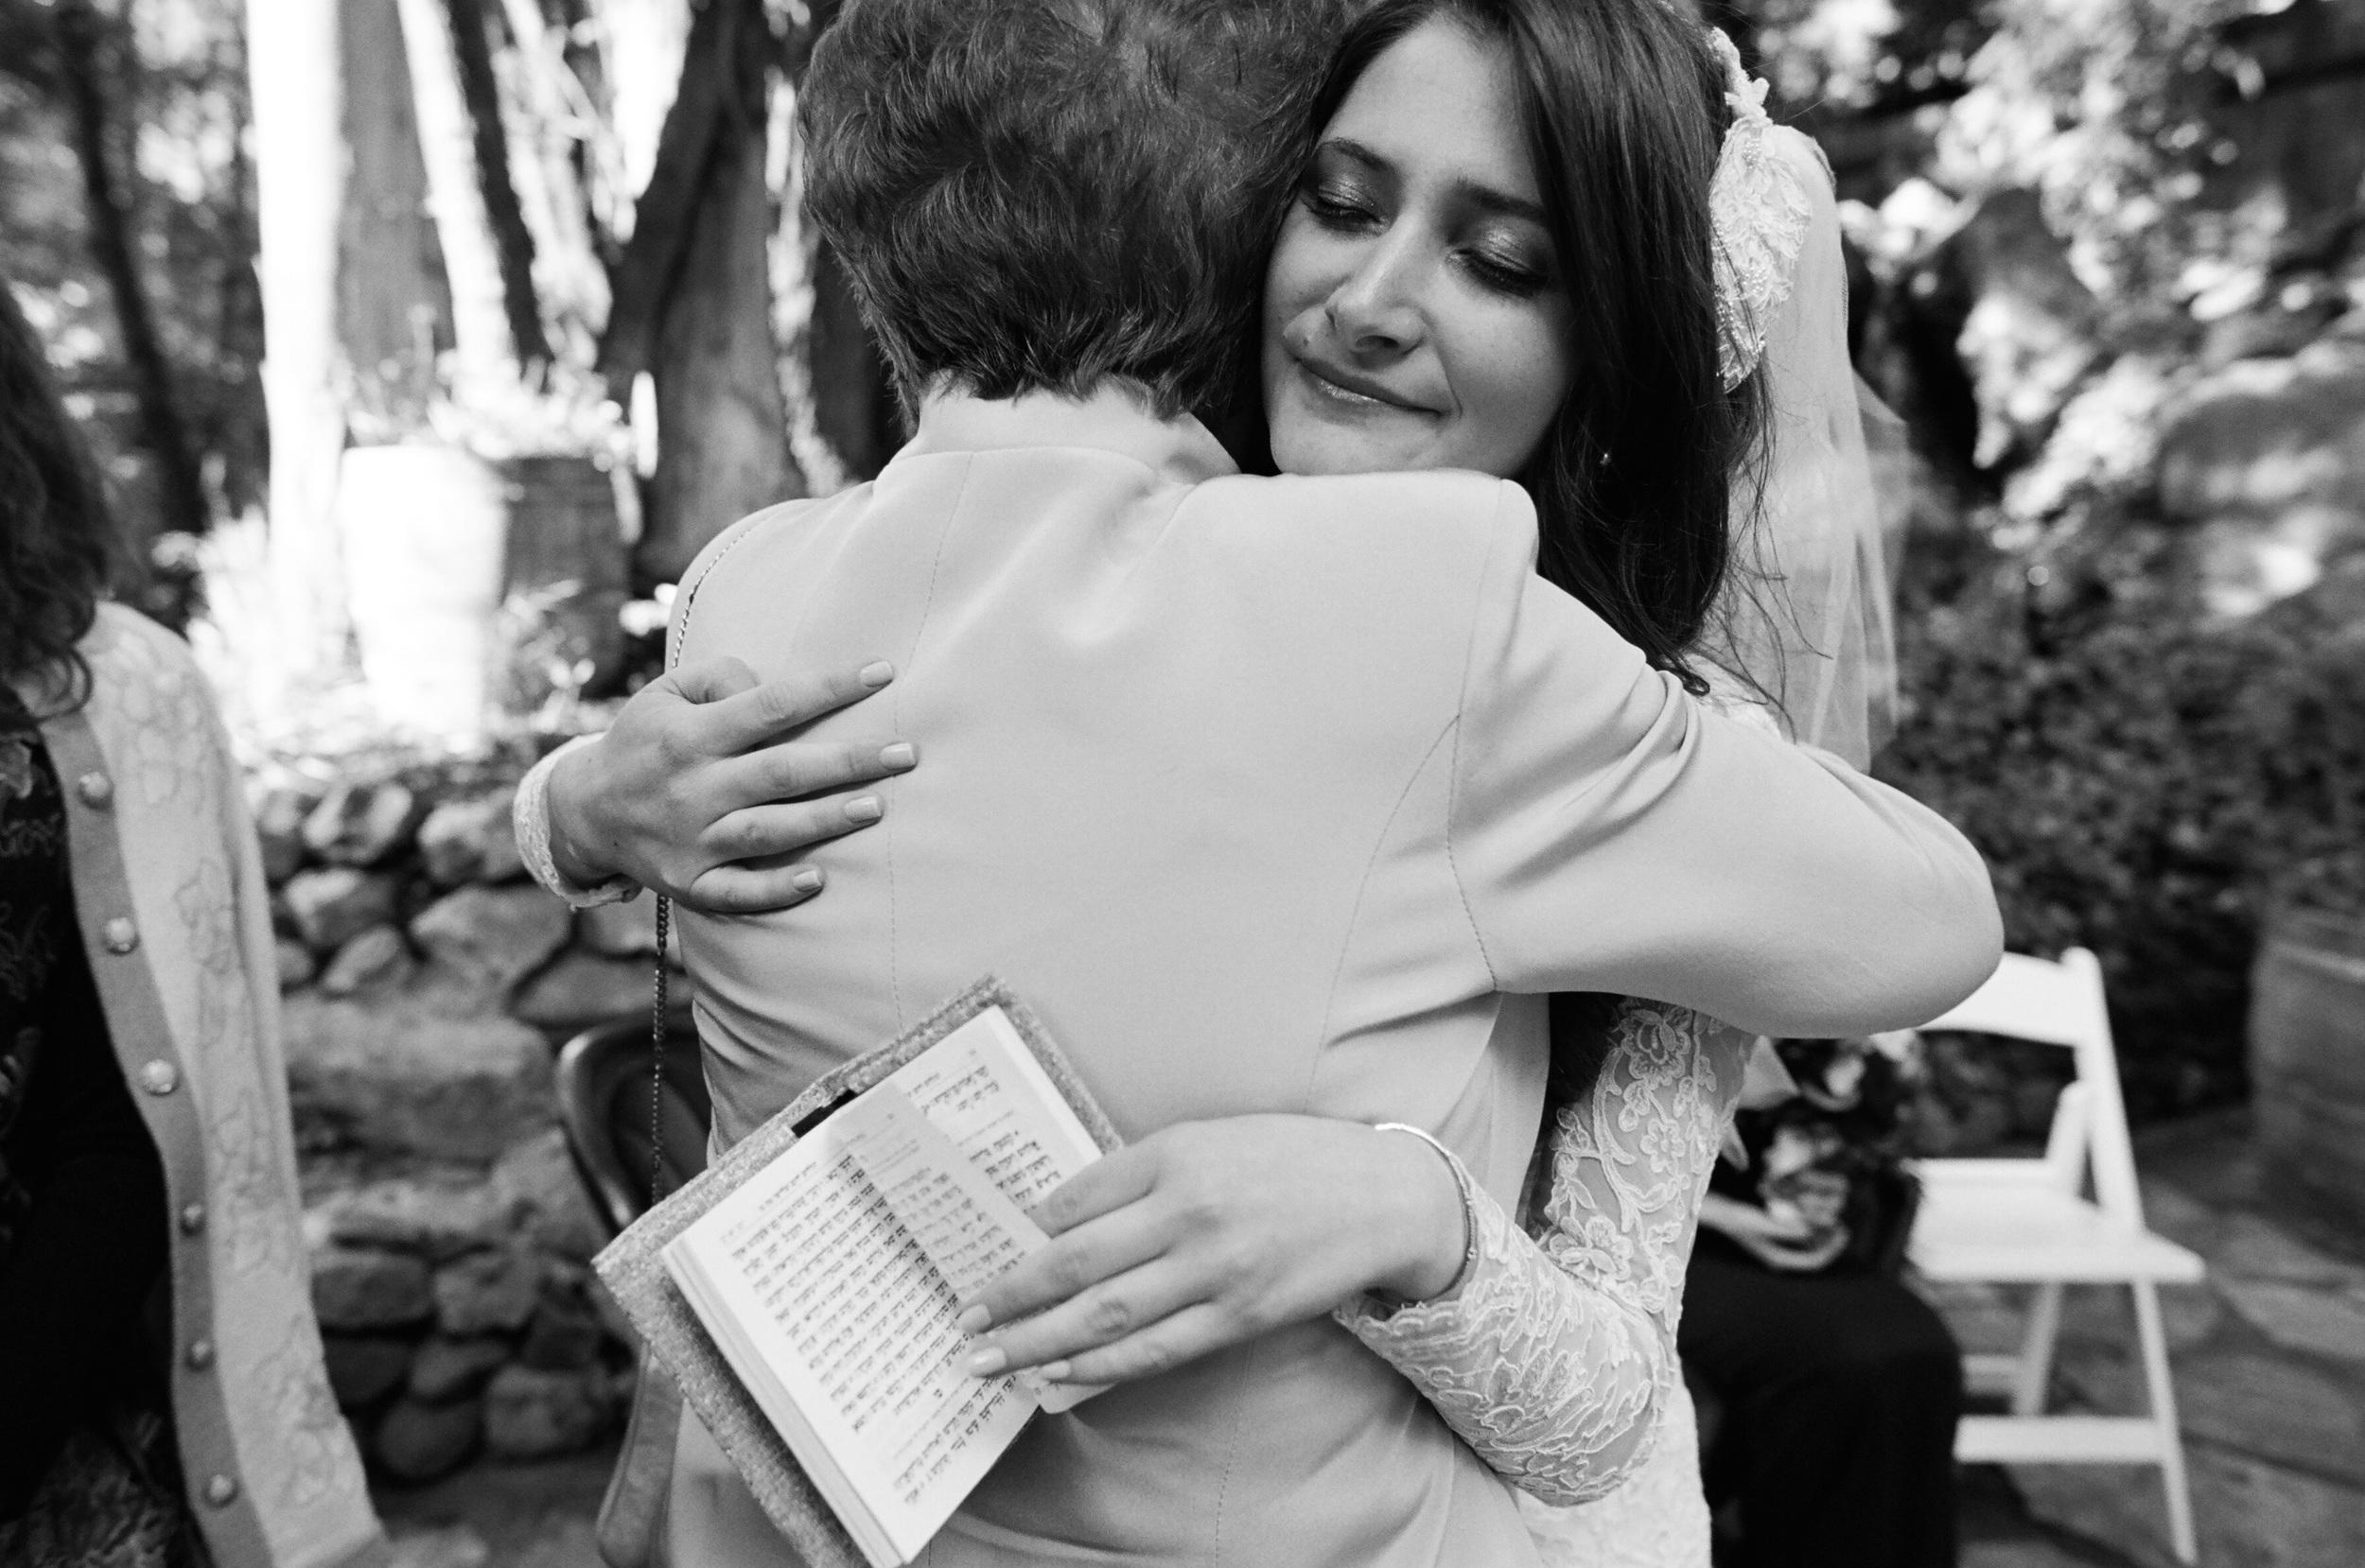 best destination wedding photographer photographs malibu wedding with orthodox jewish bride hugs grandmother while holding biblical text.